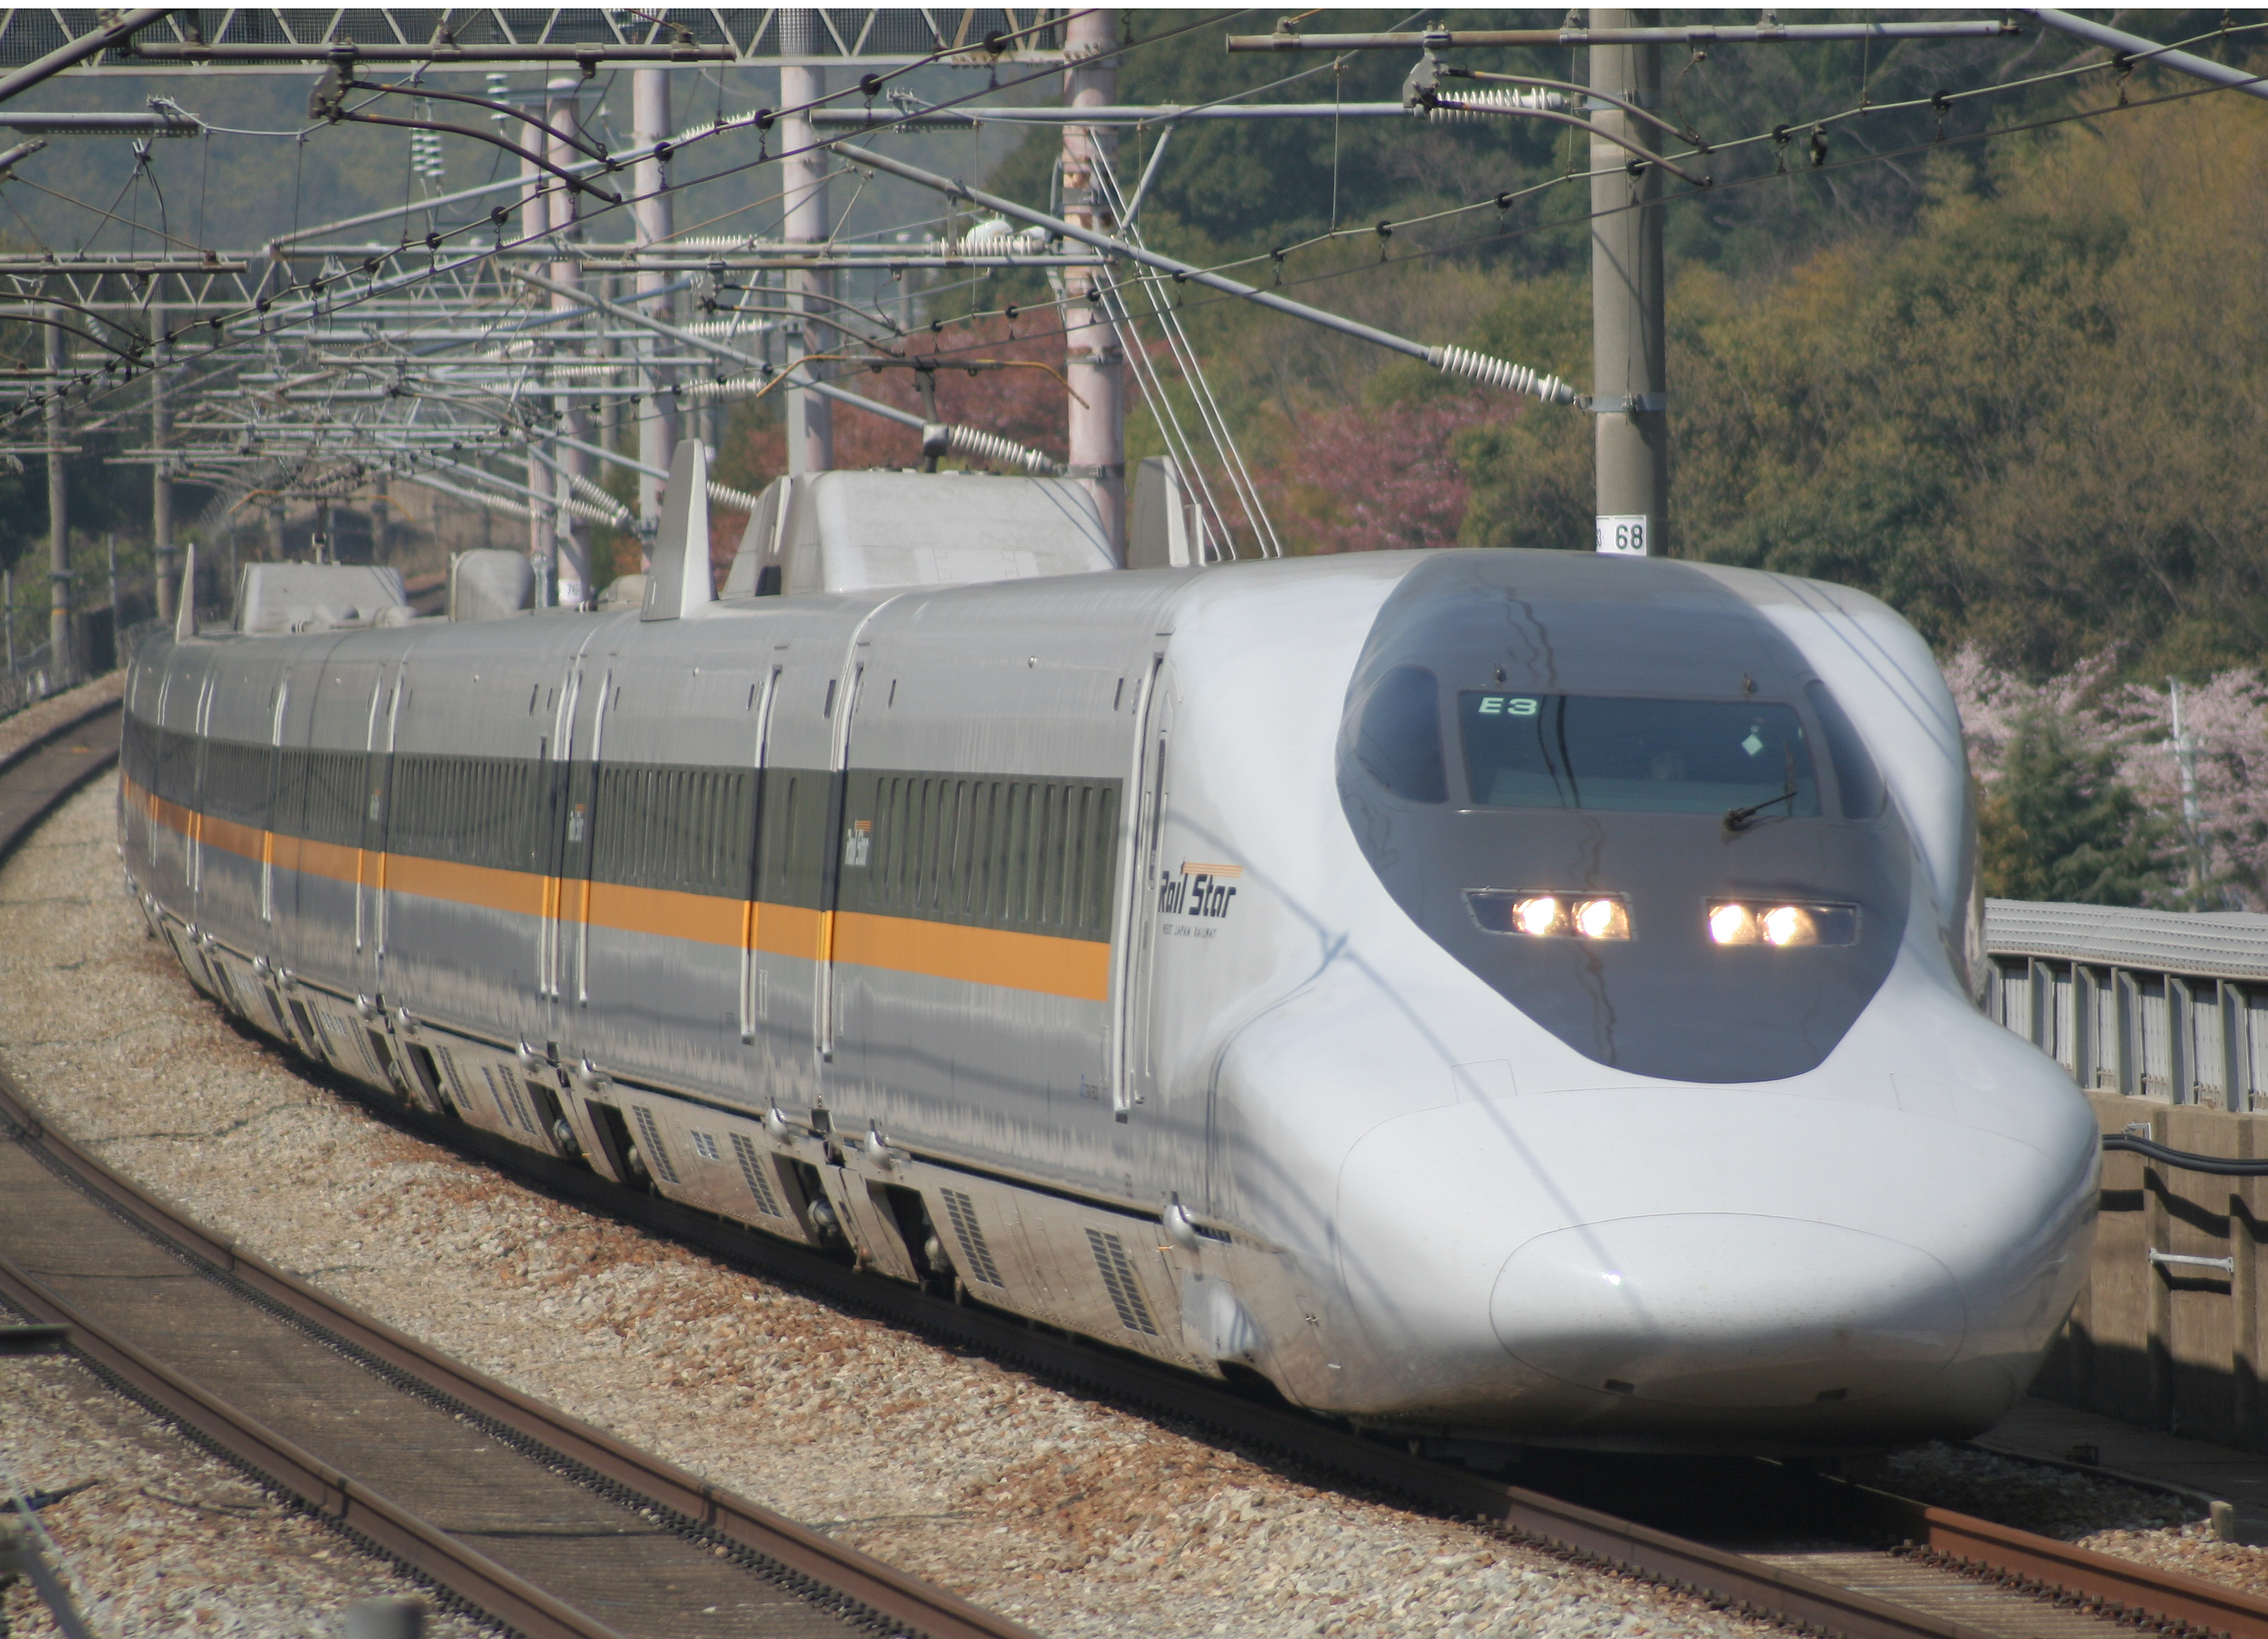 https://upload.wikimedia.org/wikipedia/commons/8/8e/JRW-700-hikari-railstar.jpg